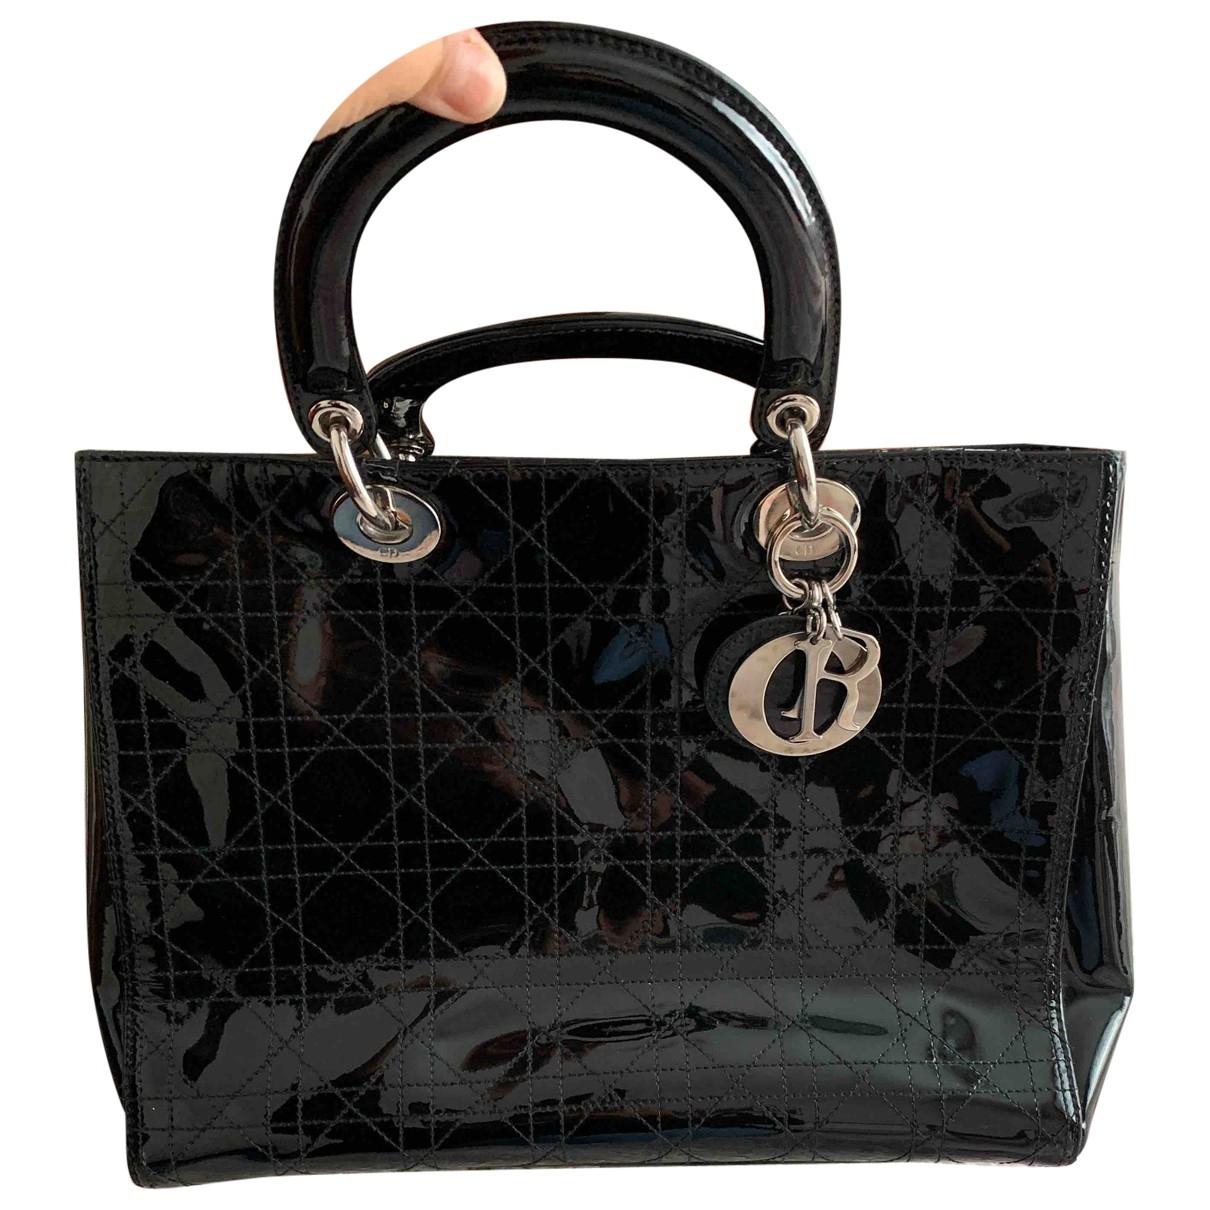 Dior Lady Dior Black Patent leather handbag for Women \N